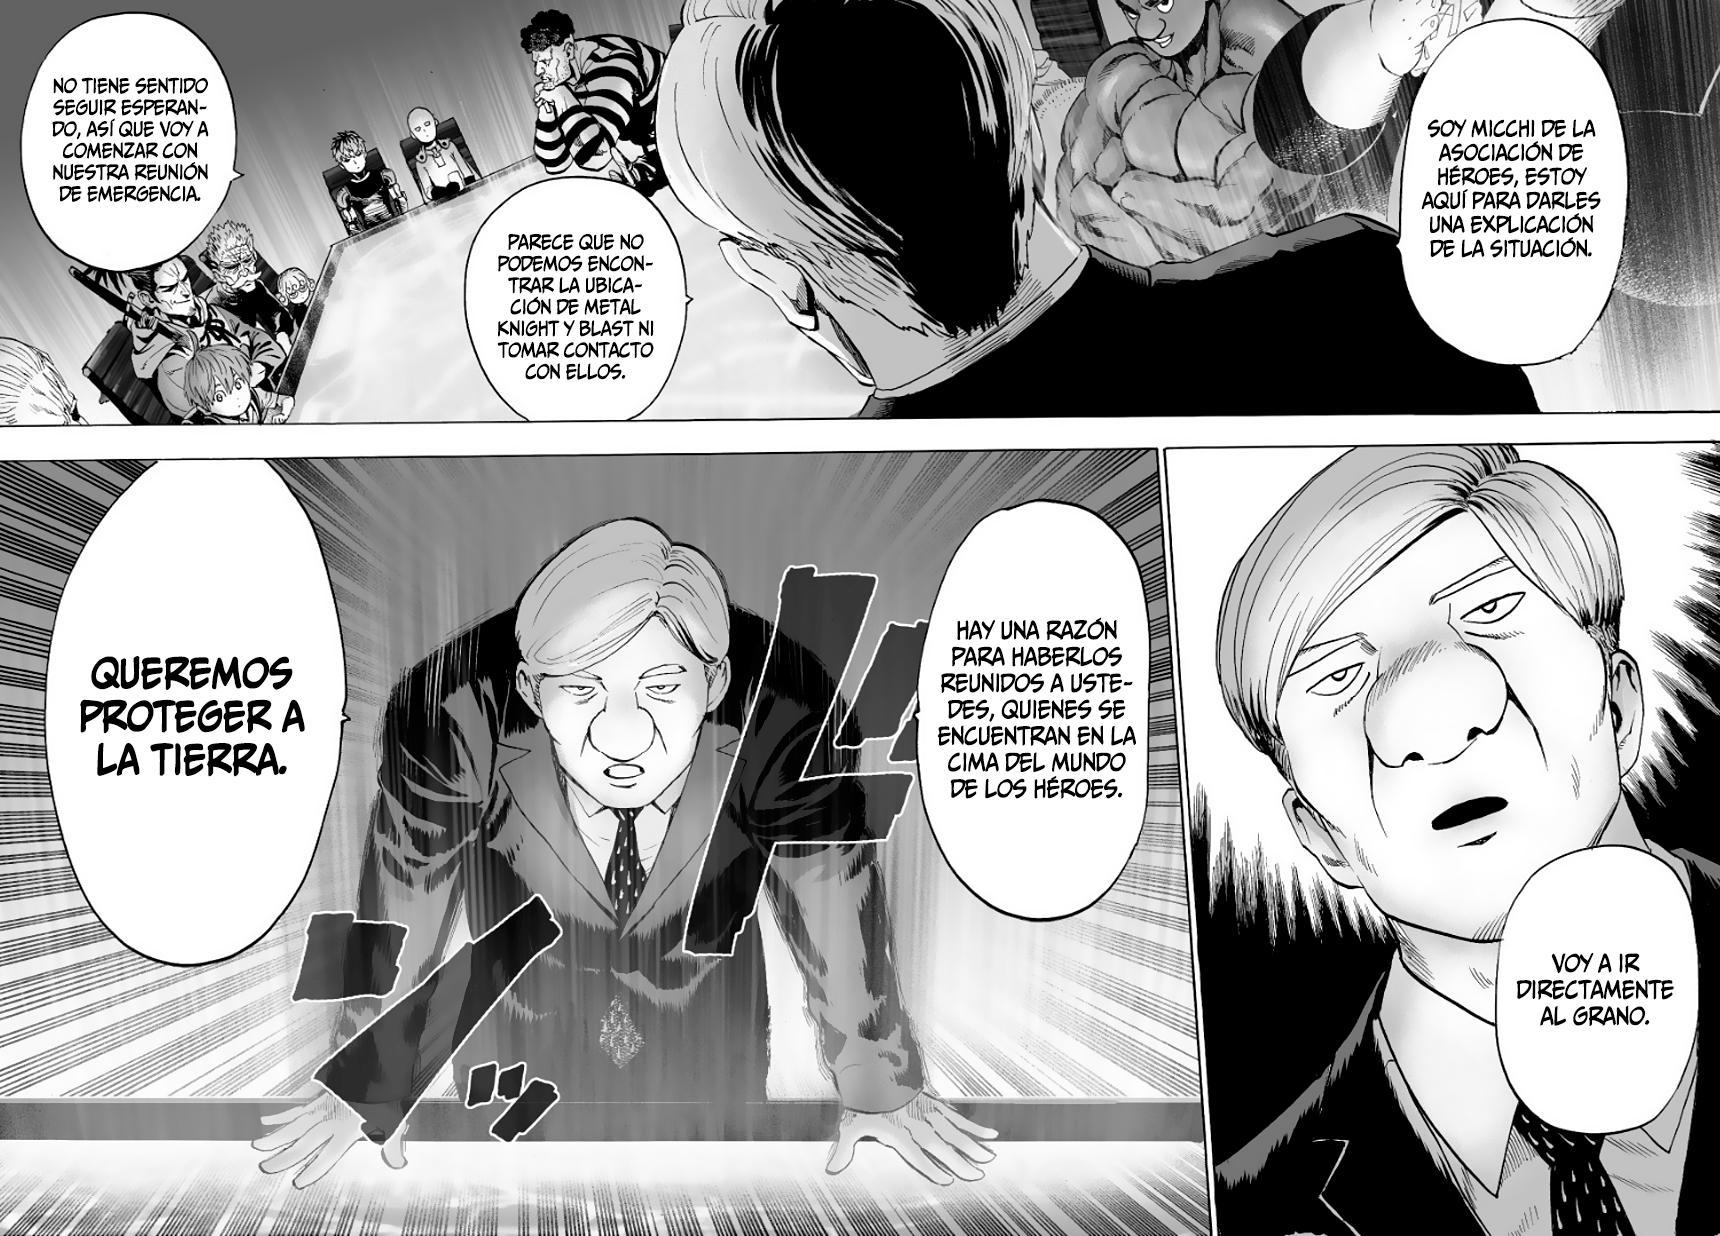 http://c5.ninemanga.com/es_manga/21/14805/362309/dfbe95ed8f50d20b4e5ca7983acd194c.jpg Page 5